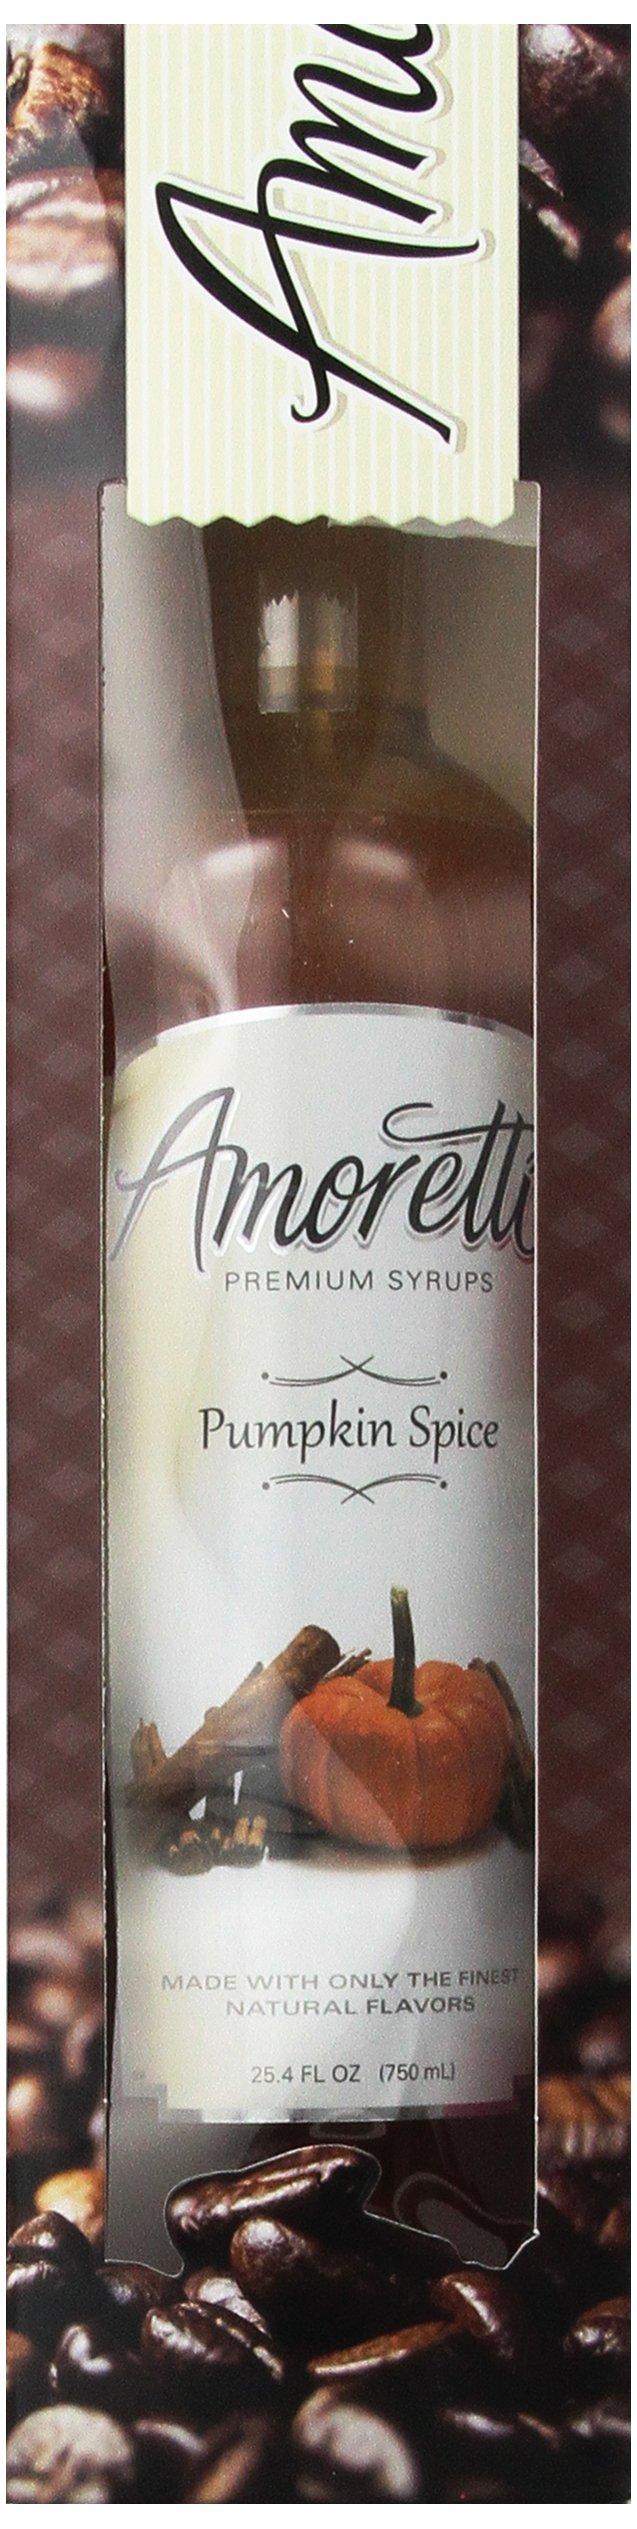 Amoretti Premium Pumpkin Spice Syrup 750ml 3 Pack